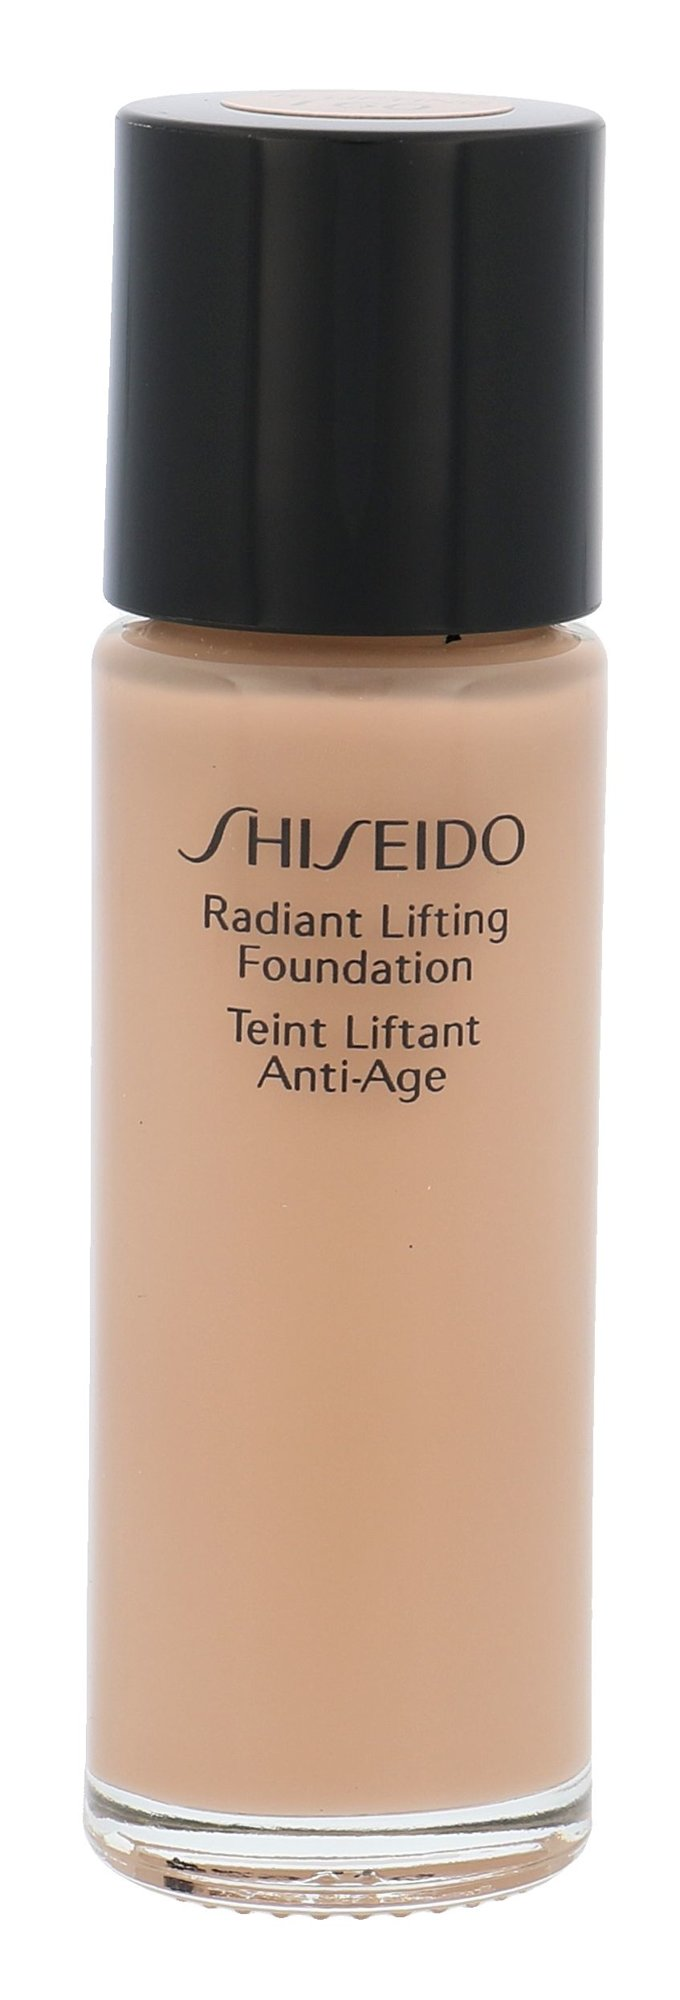 Shiseido Radiant Lifting Foundation Cosmetic 15ml I60 Natural Deep Ivory